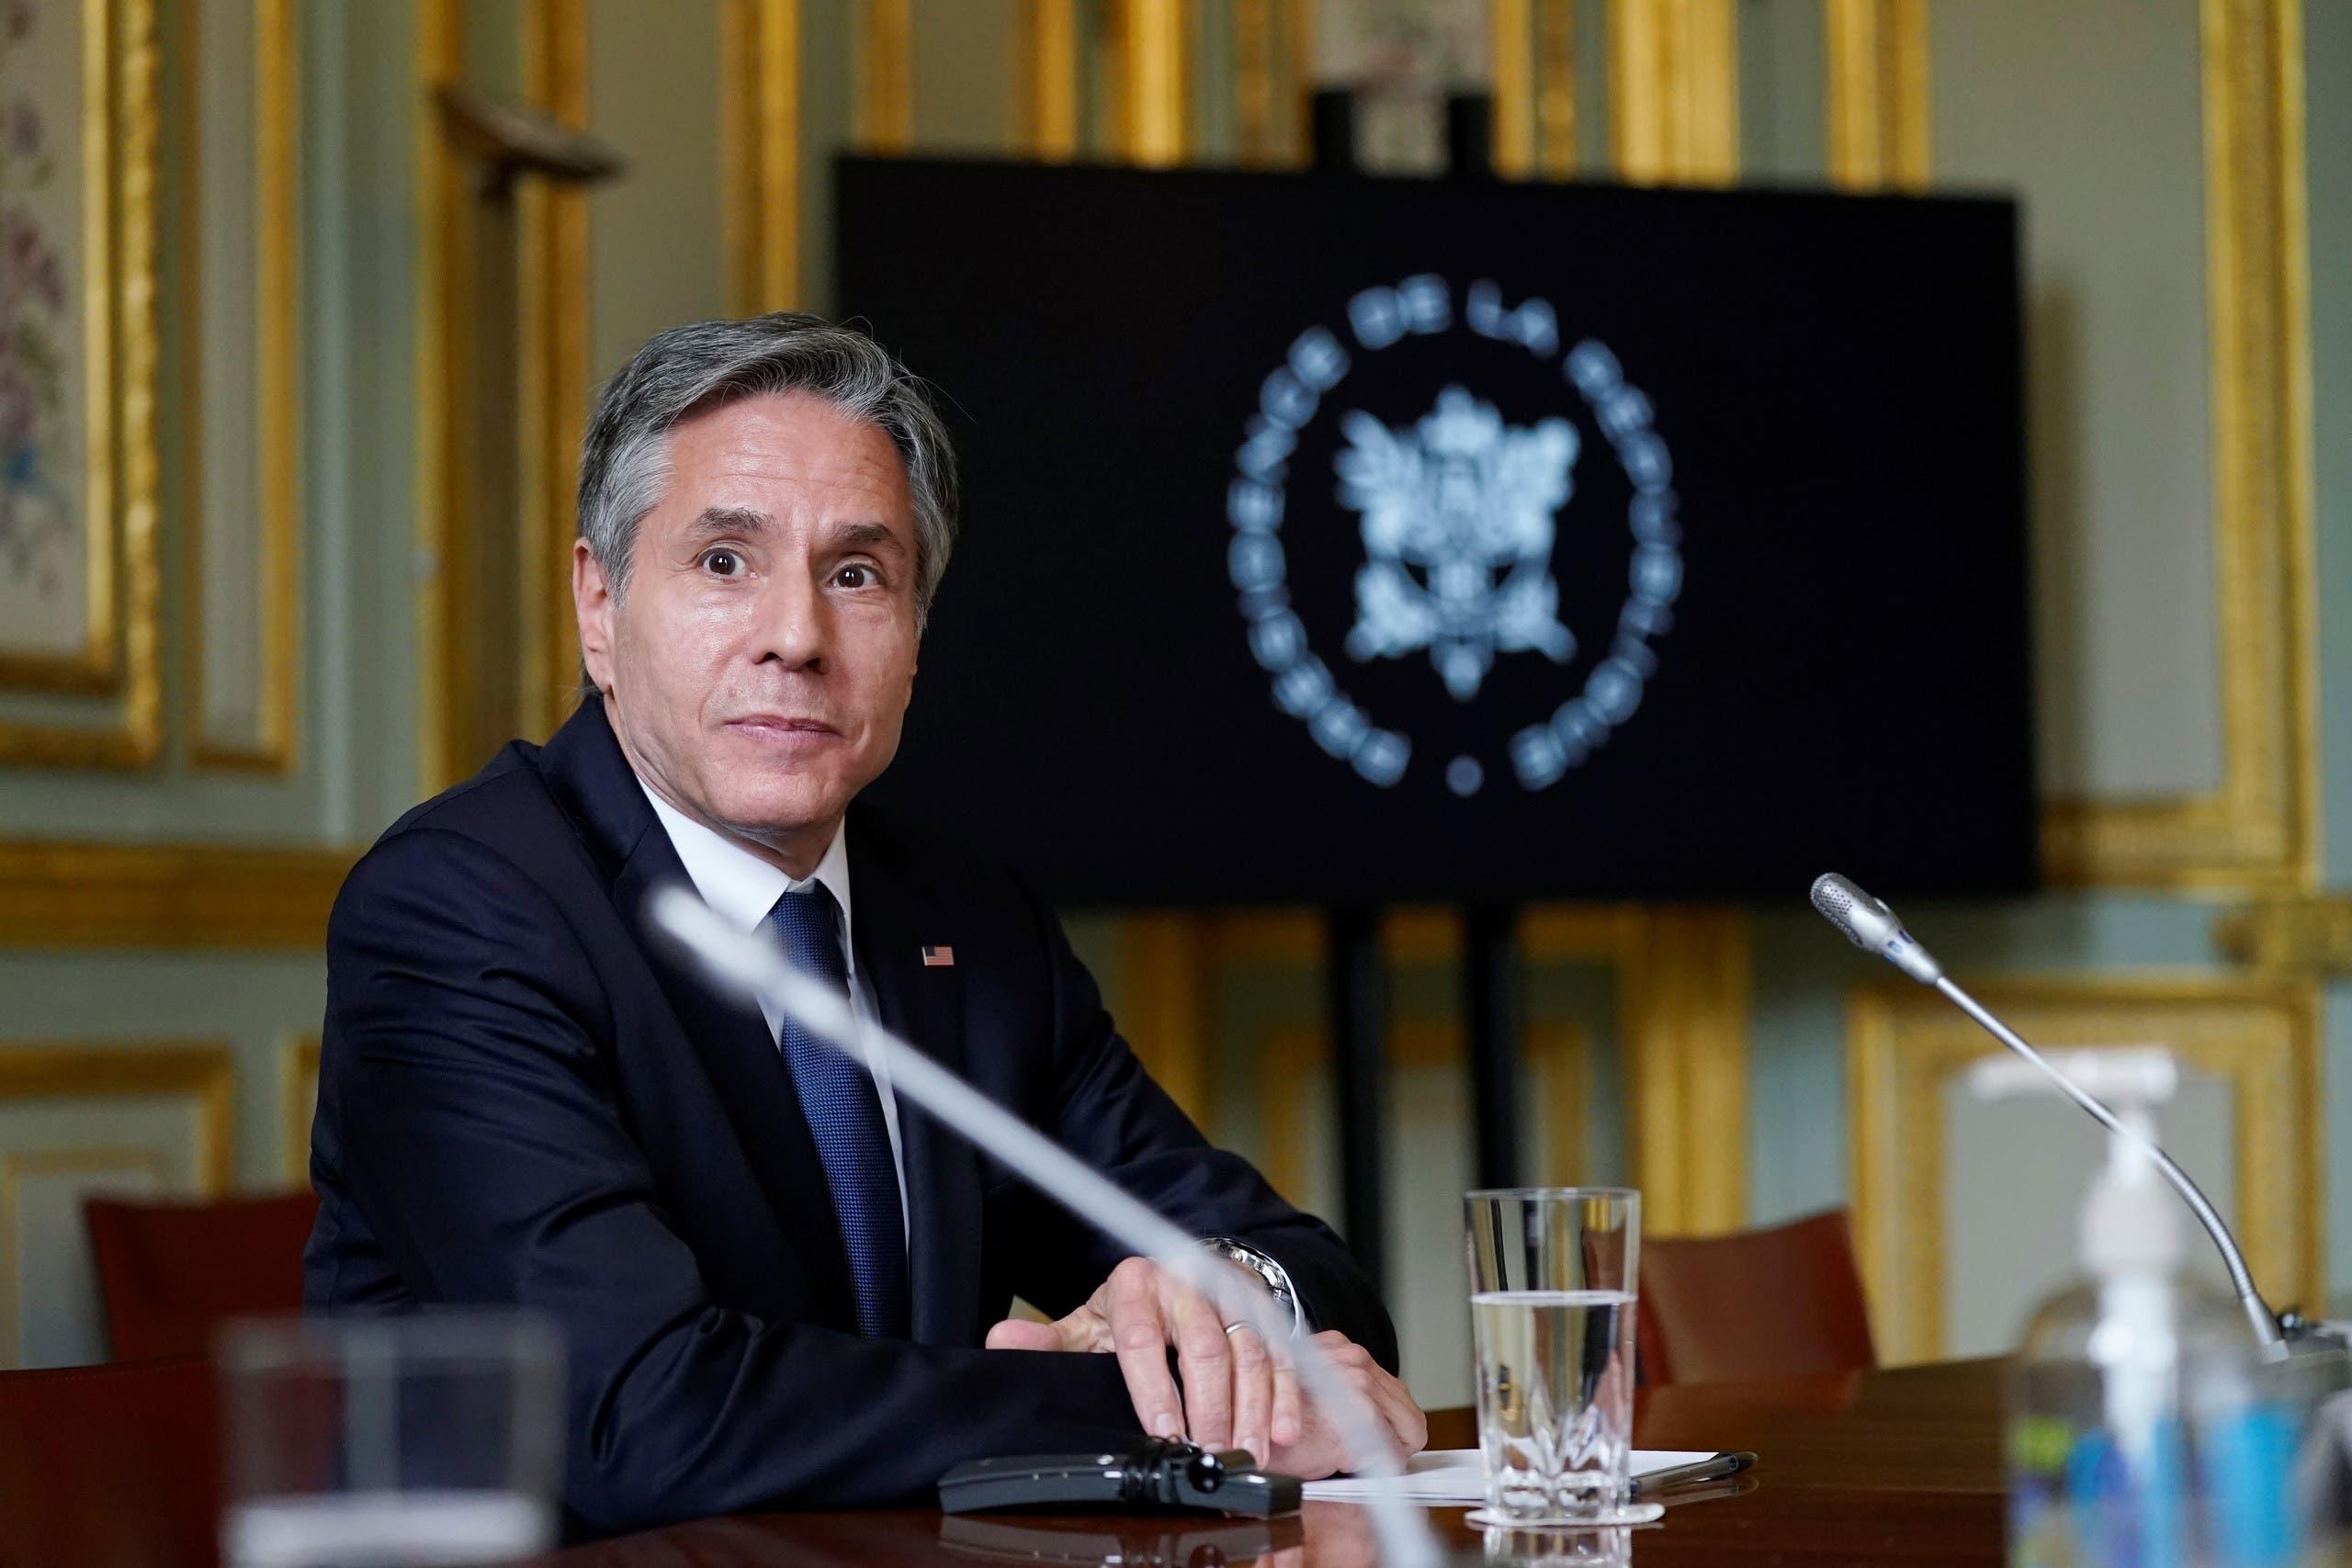 US Secretary of State, Anthony Blinken